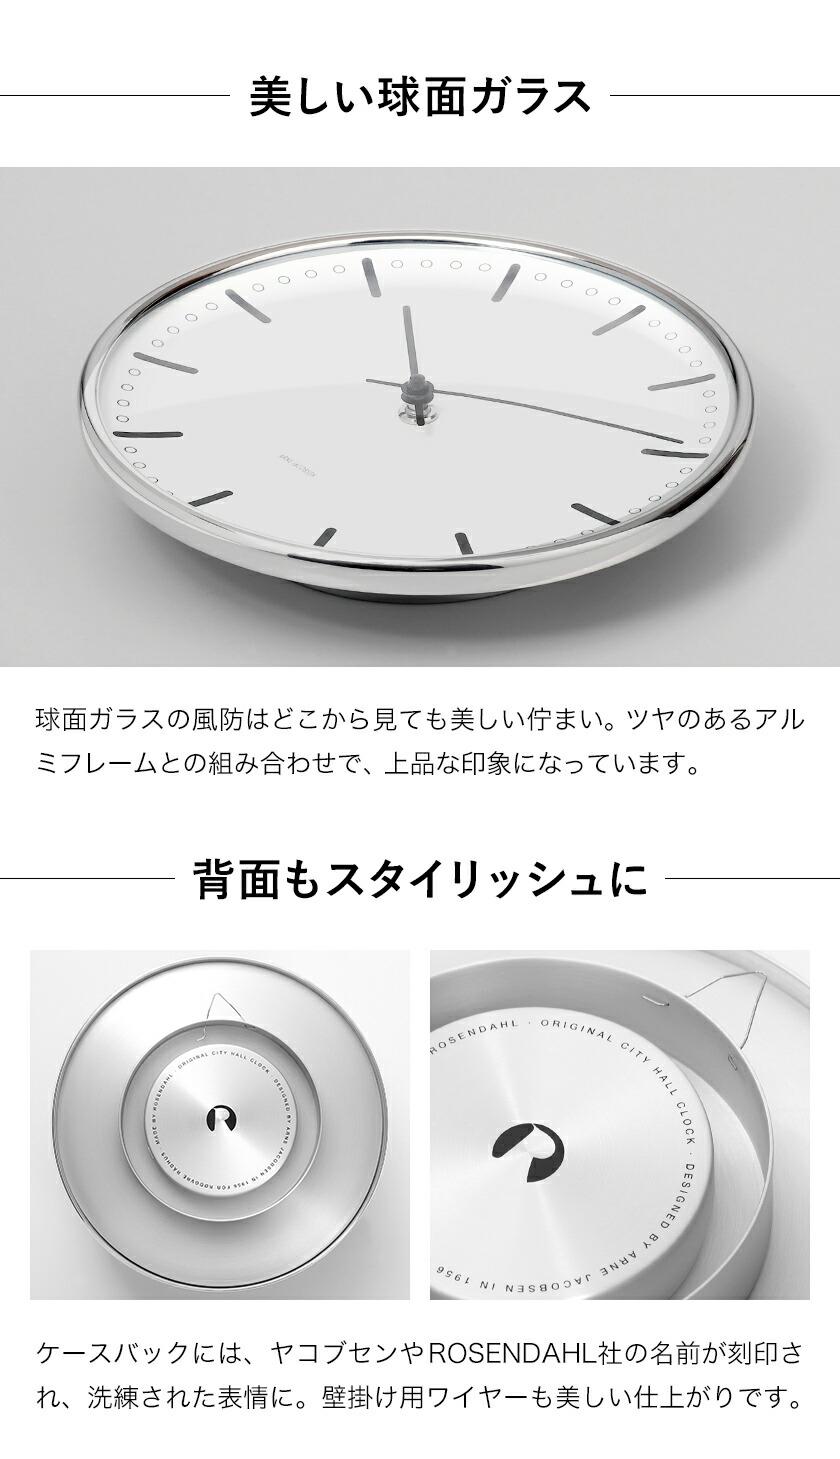 ARNE JACOBSENのシティホールの掛け時計